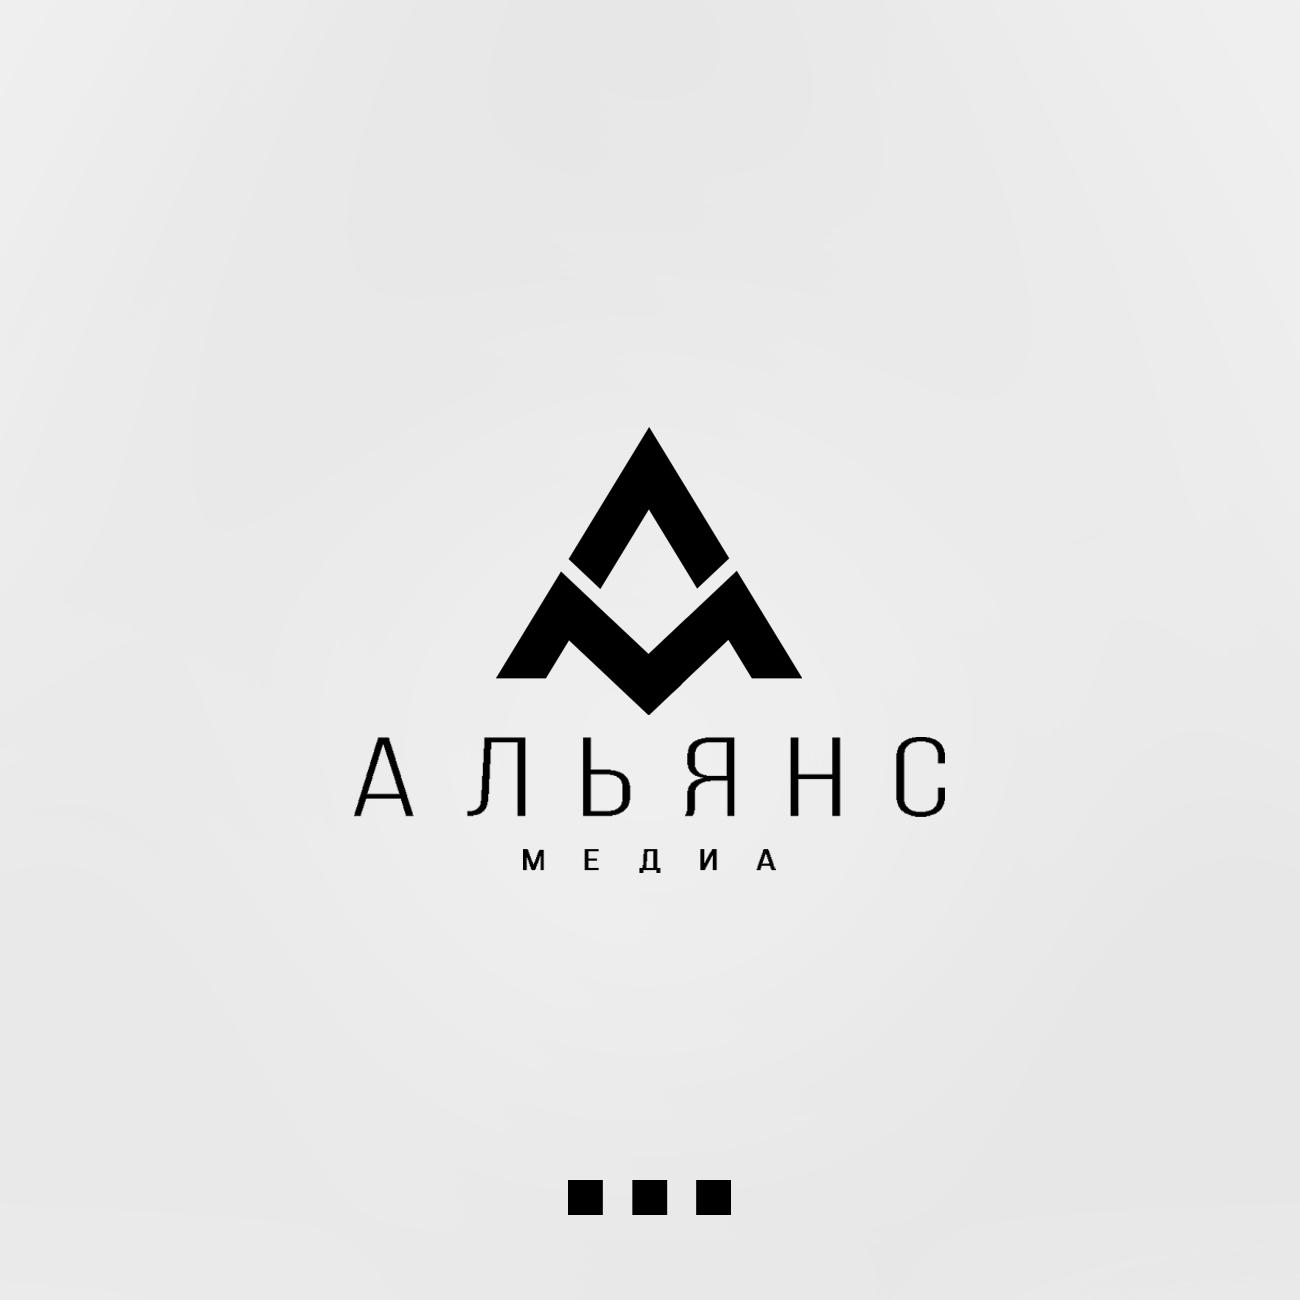 Создать логотип для компании фото f_0435ab29655b24e2.jpg